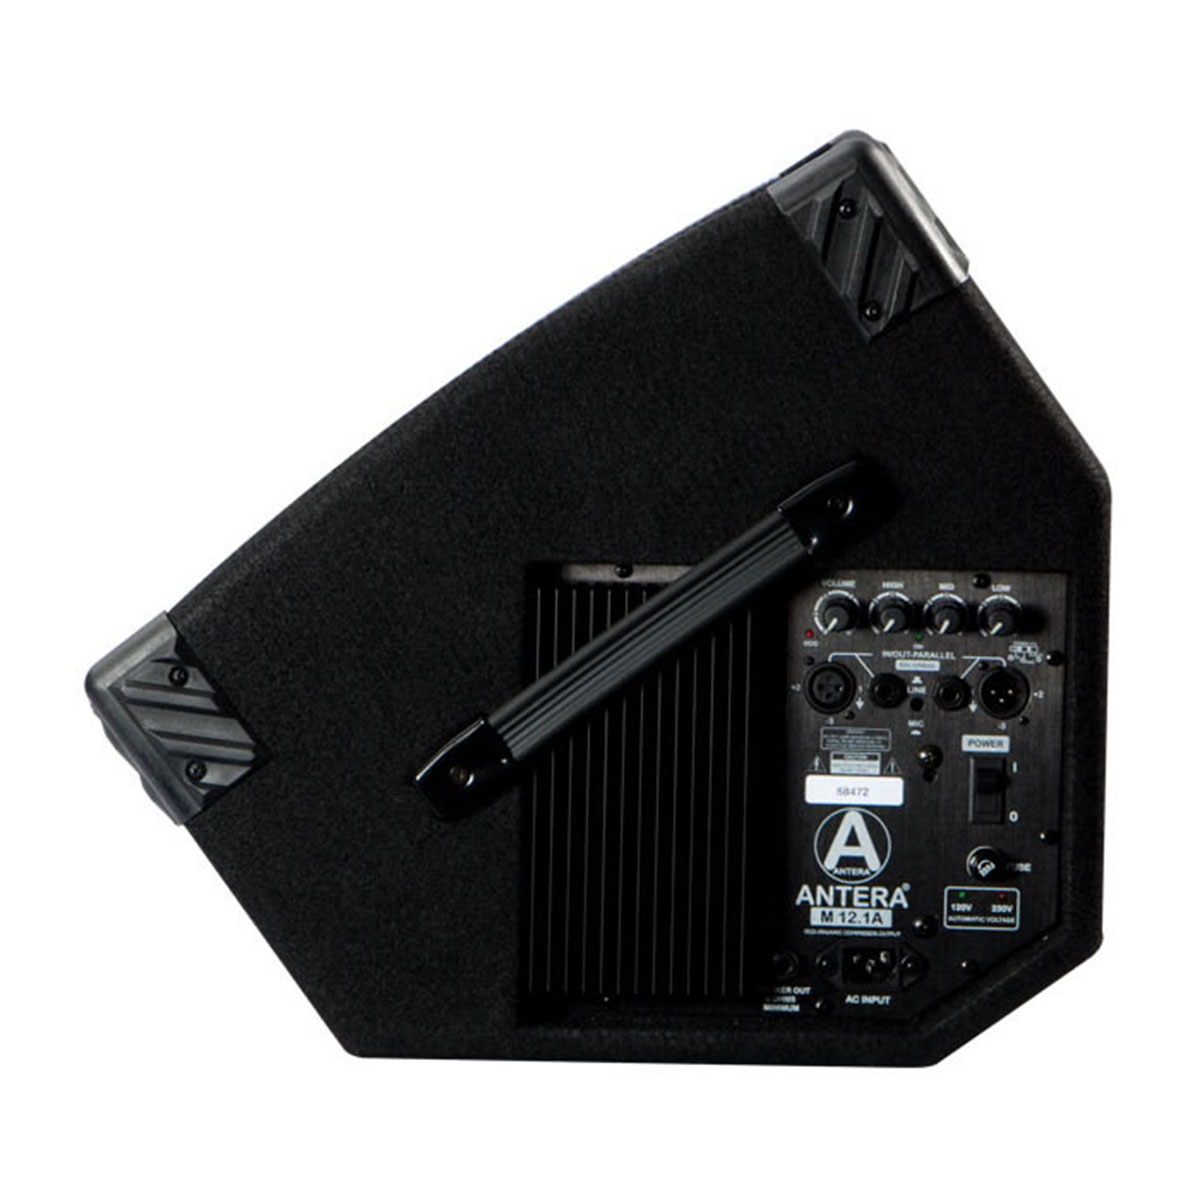 Monitor Ativo Fal 12 Pol 170W - M 12 1 A Antera